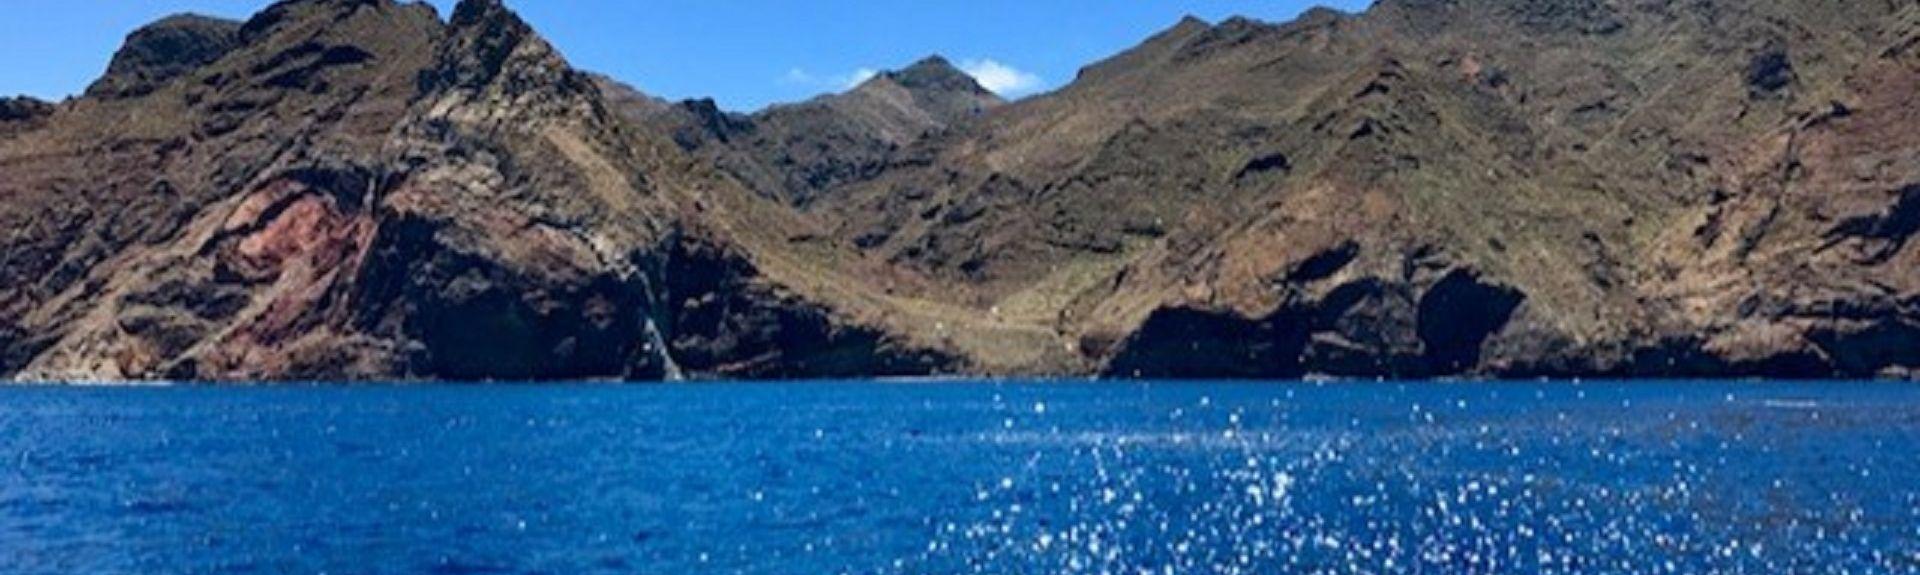 La Guancha, Santa Cruz de Tenerife, Spain